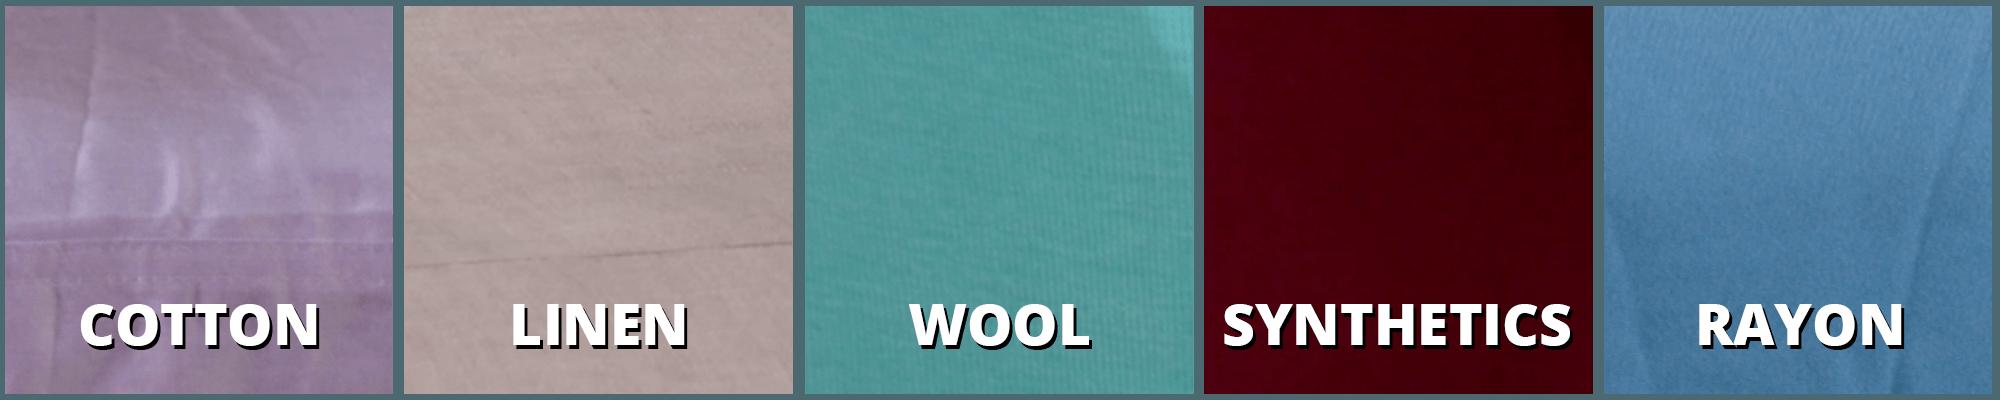 cotton, linen, wool, synthetics